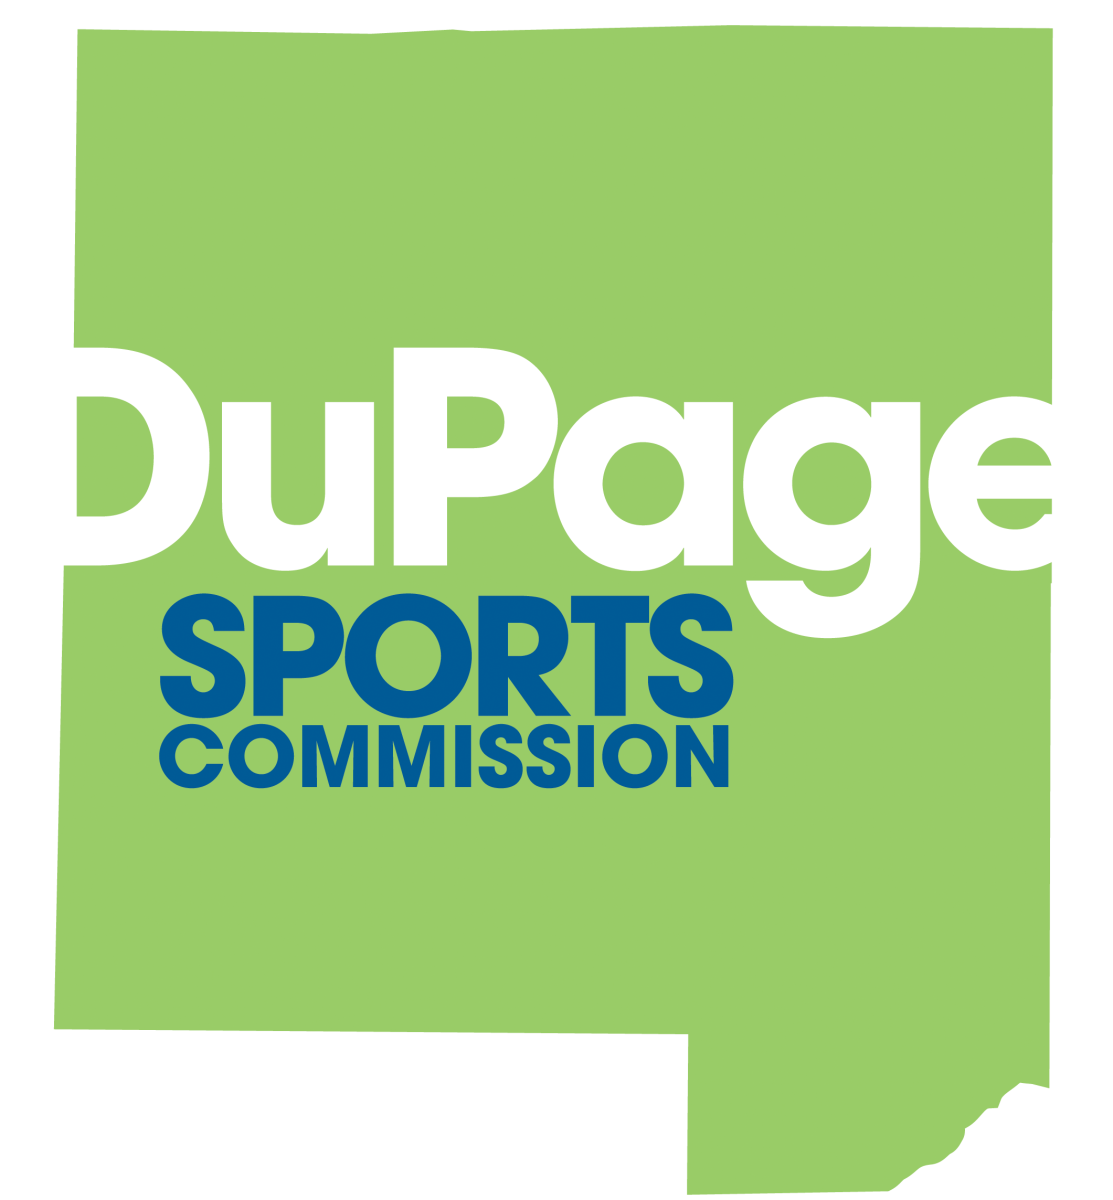 DuPage Sports